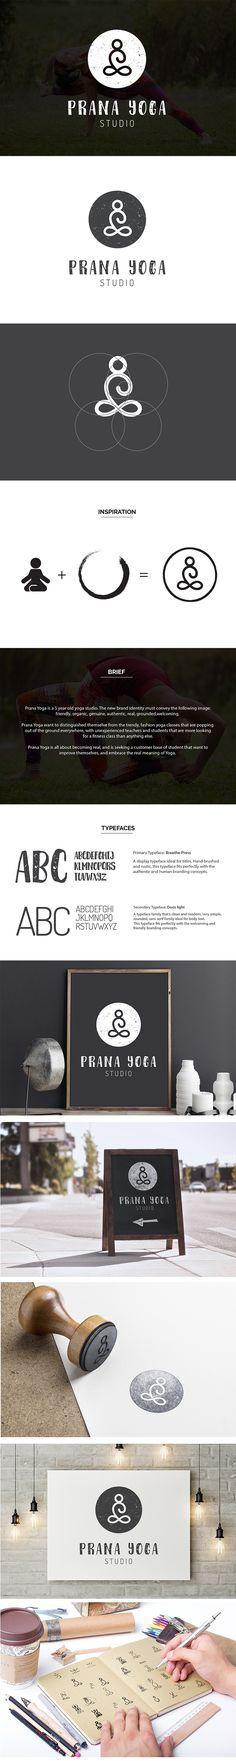 Logo Design Yoga Studio, Yogi Branding | minimal, one stroke, line, geometric, modern, friendly, real, organic | Prana Yoga, Roleystone | Valhalla Creative Design, Perth